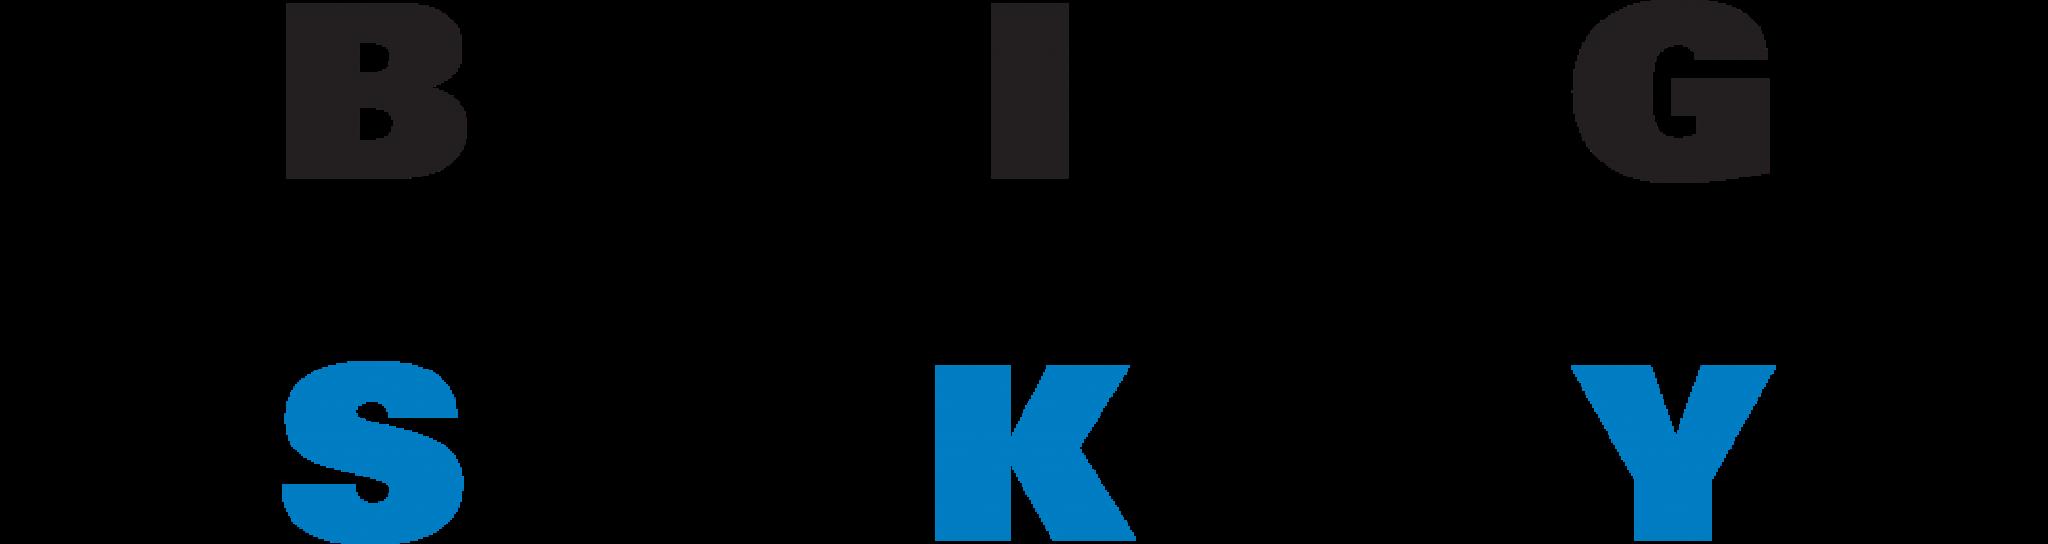 Bigskynw Logo